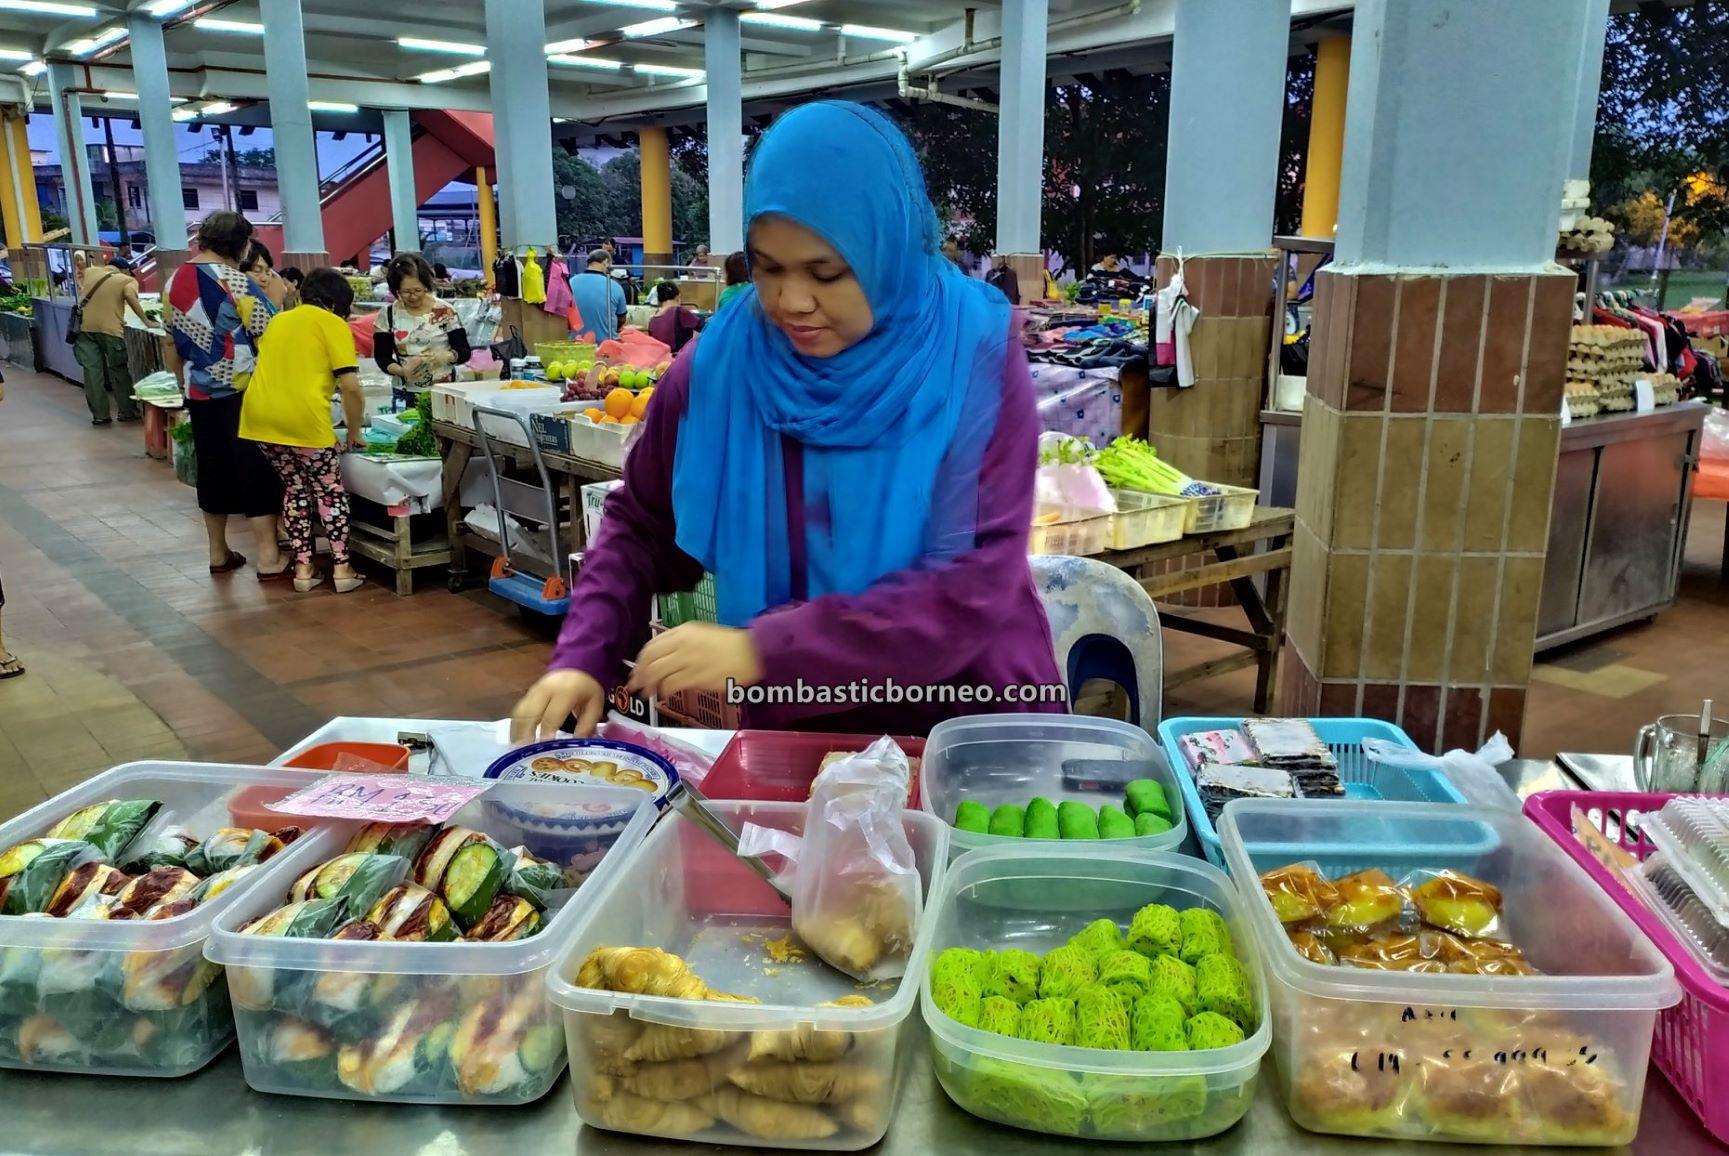 fruits, vegetable, backpackers, Destination, exploration, Pasar tamu, native, Miri, town, Tourism, tourist attraction, Trans Borneo, 马来西亚美里, 砂拉越马鲁帝早市,